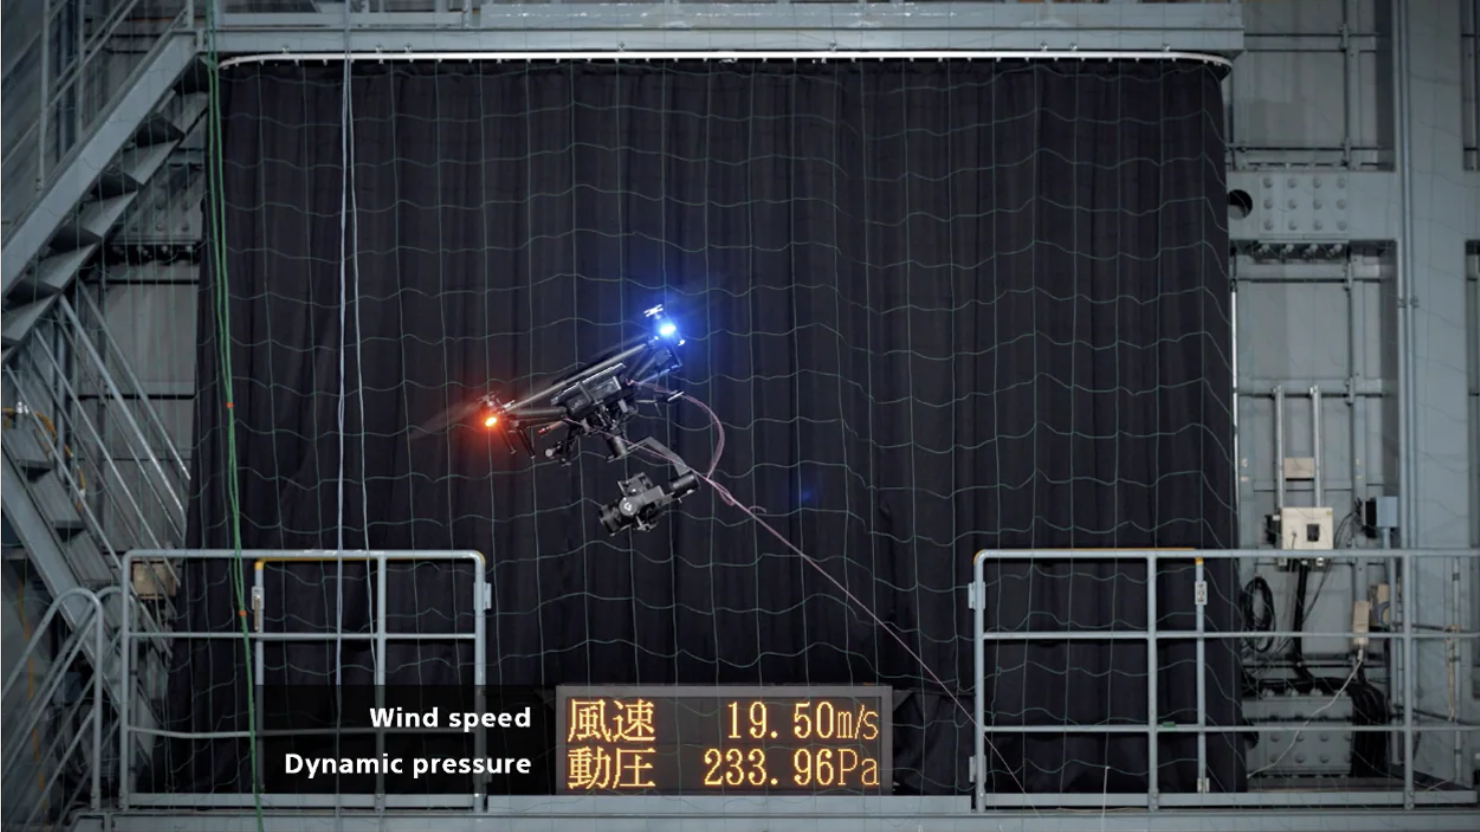 Sony 曝光 Airpeak 無人機風洞測試影片 70km/h 風力下仍可穩定懸停